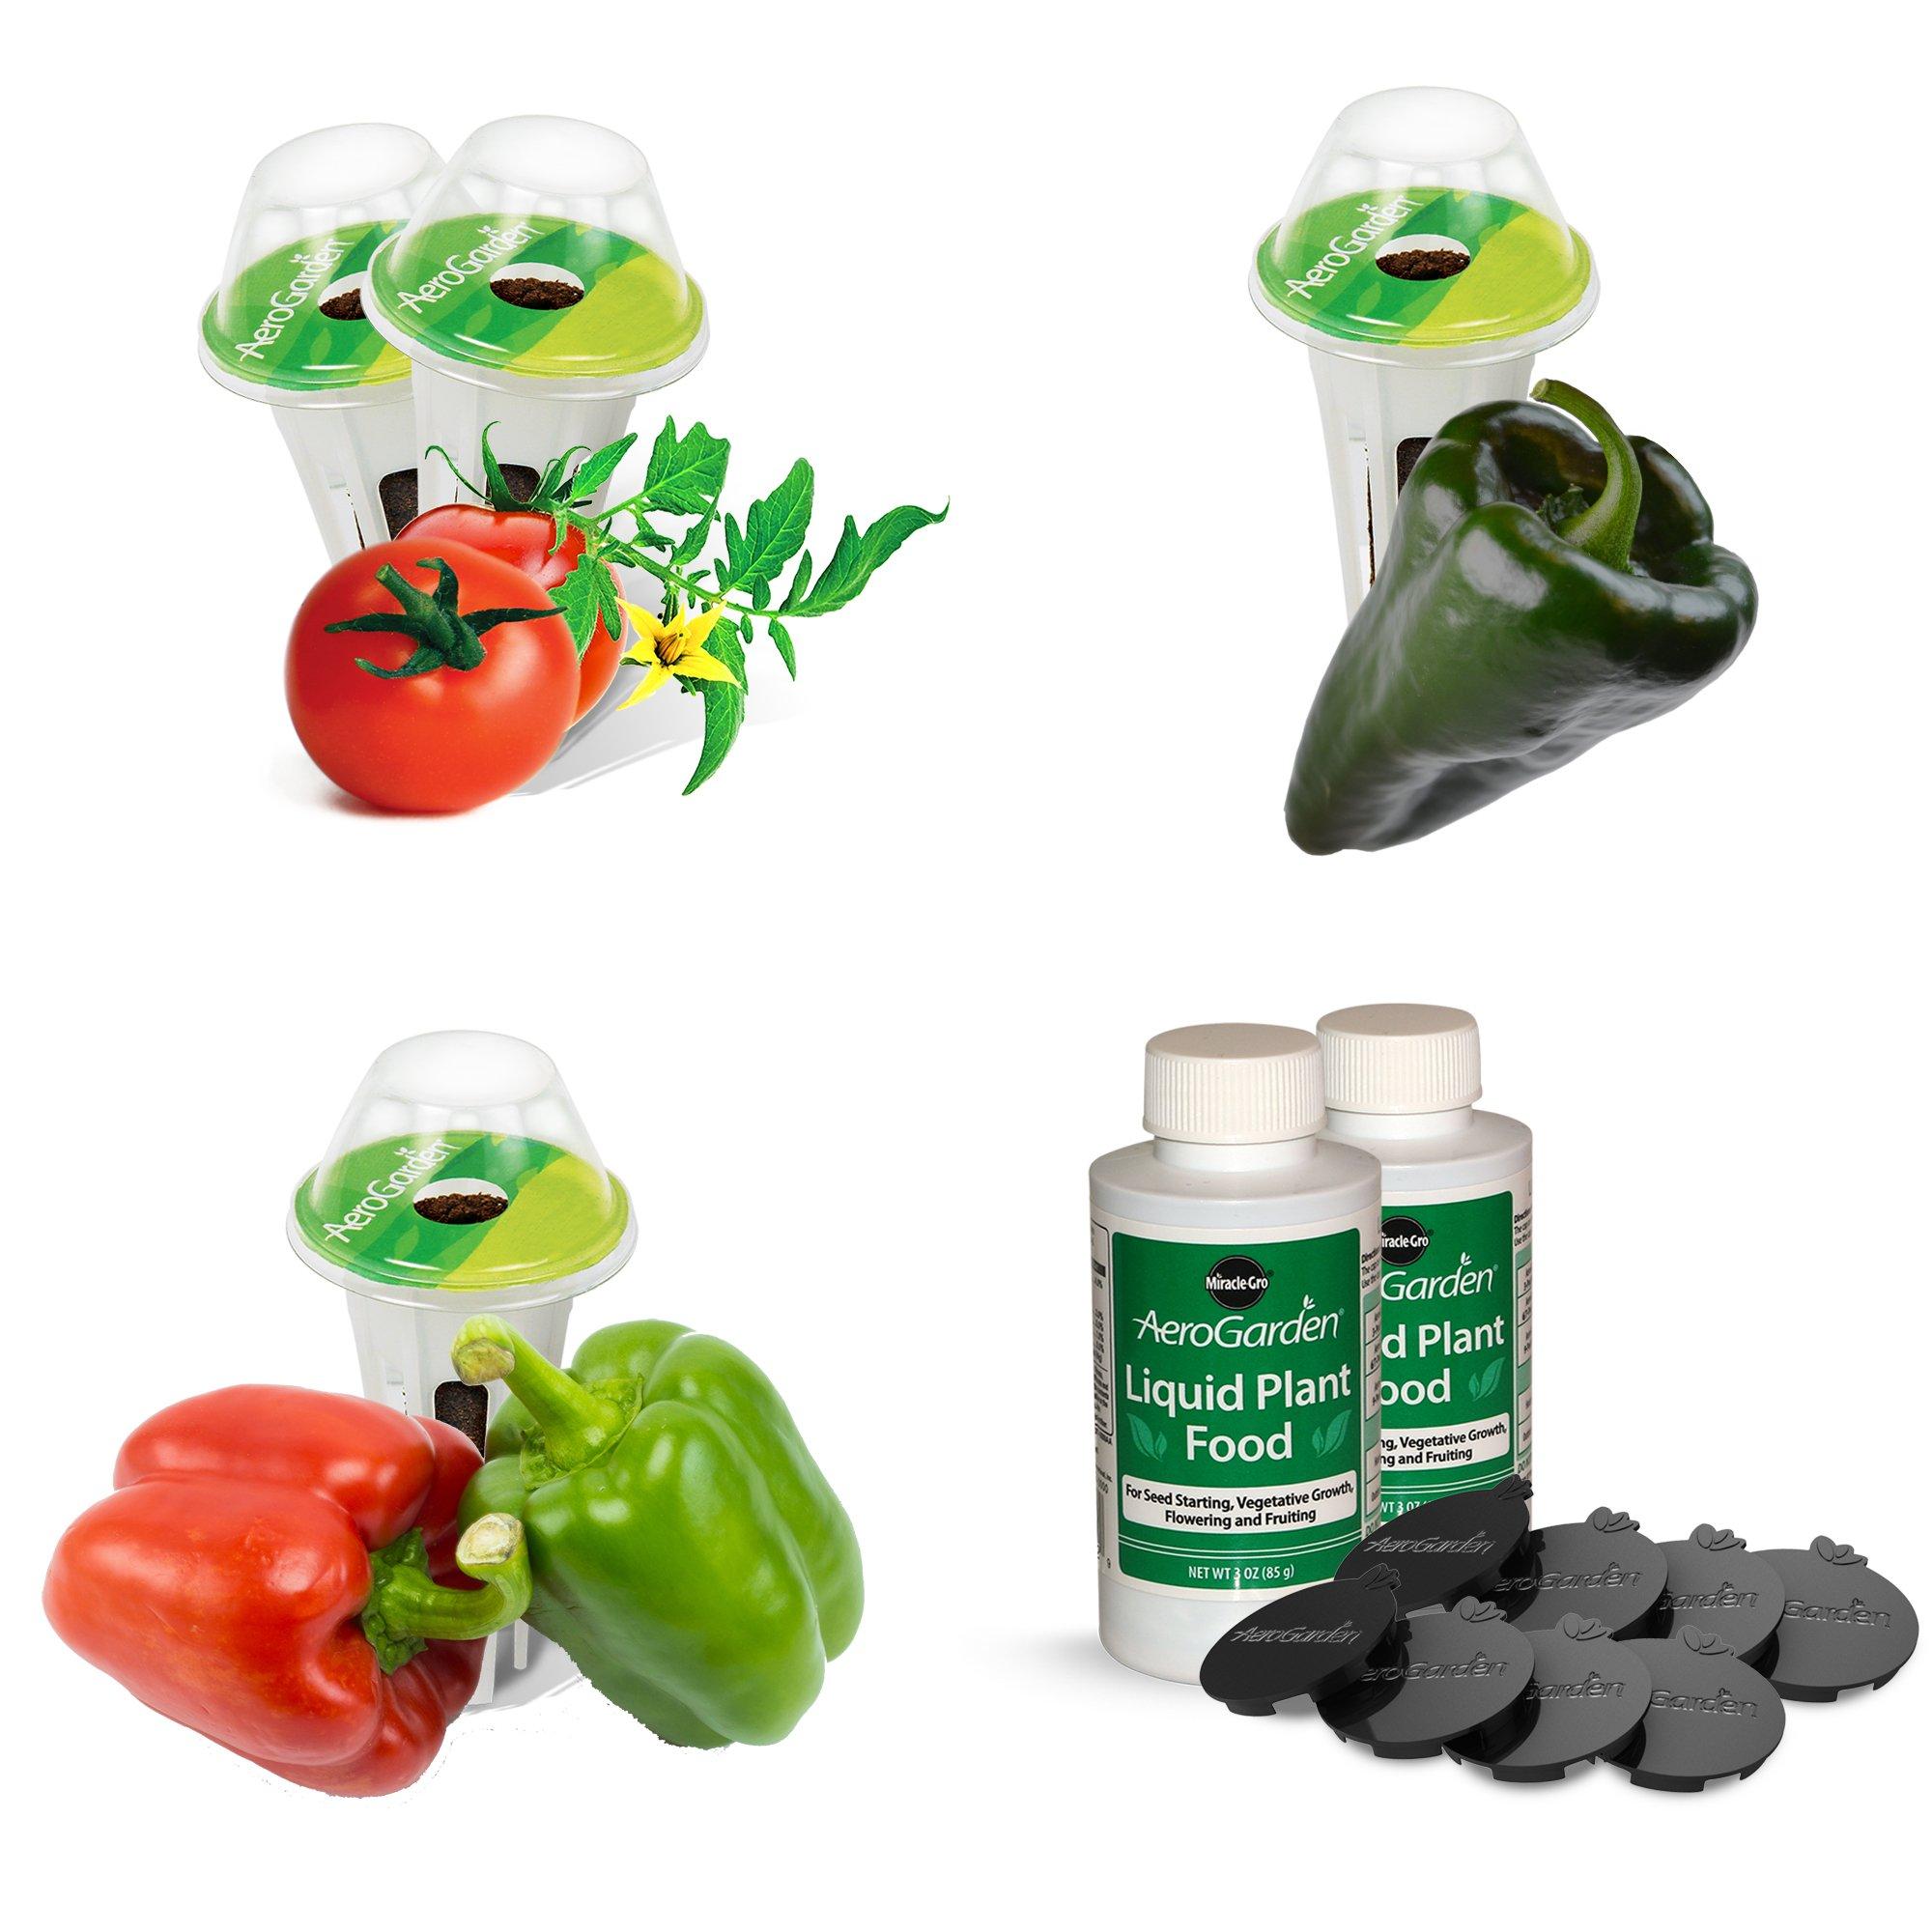 AeroGarden Jumbo Veggies Kit (For Farm Plus models)